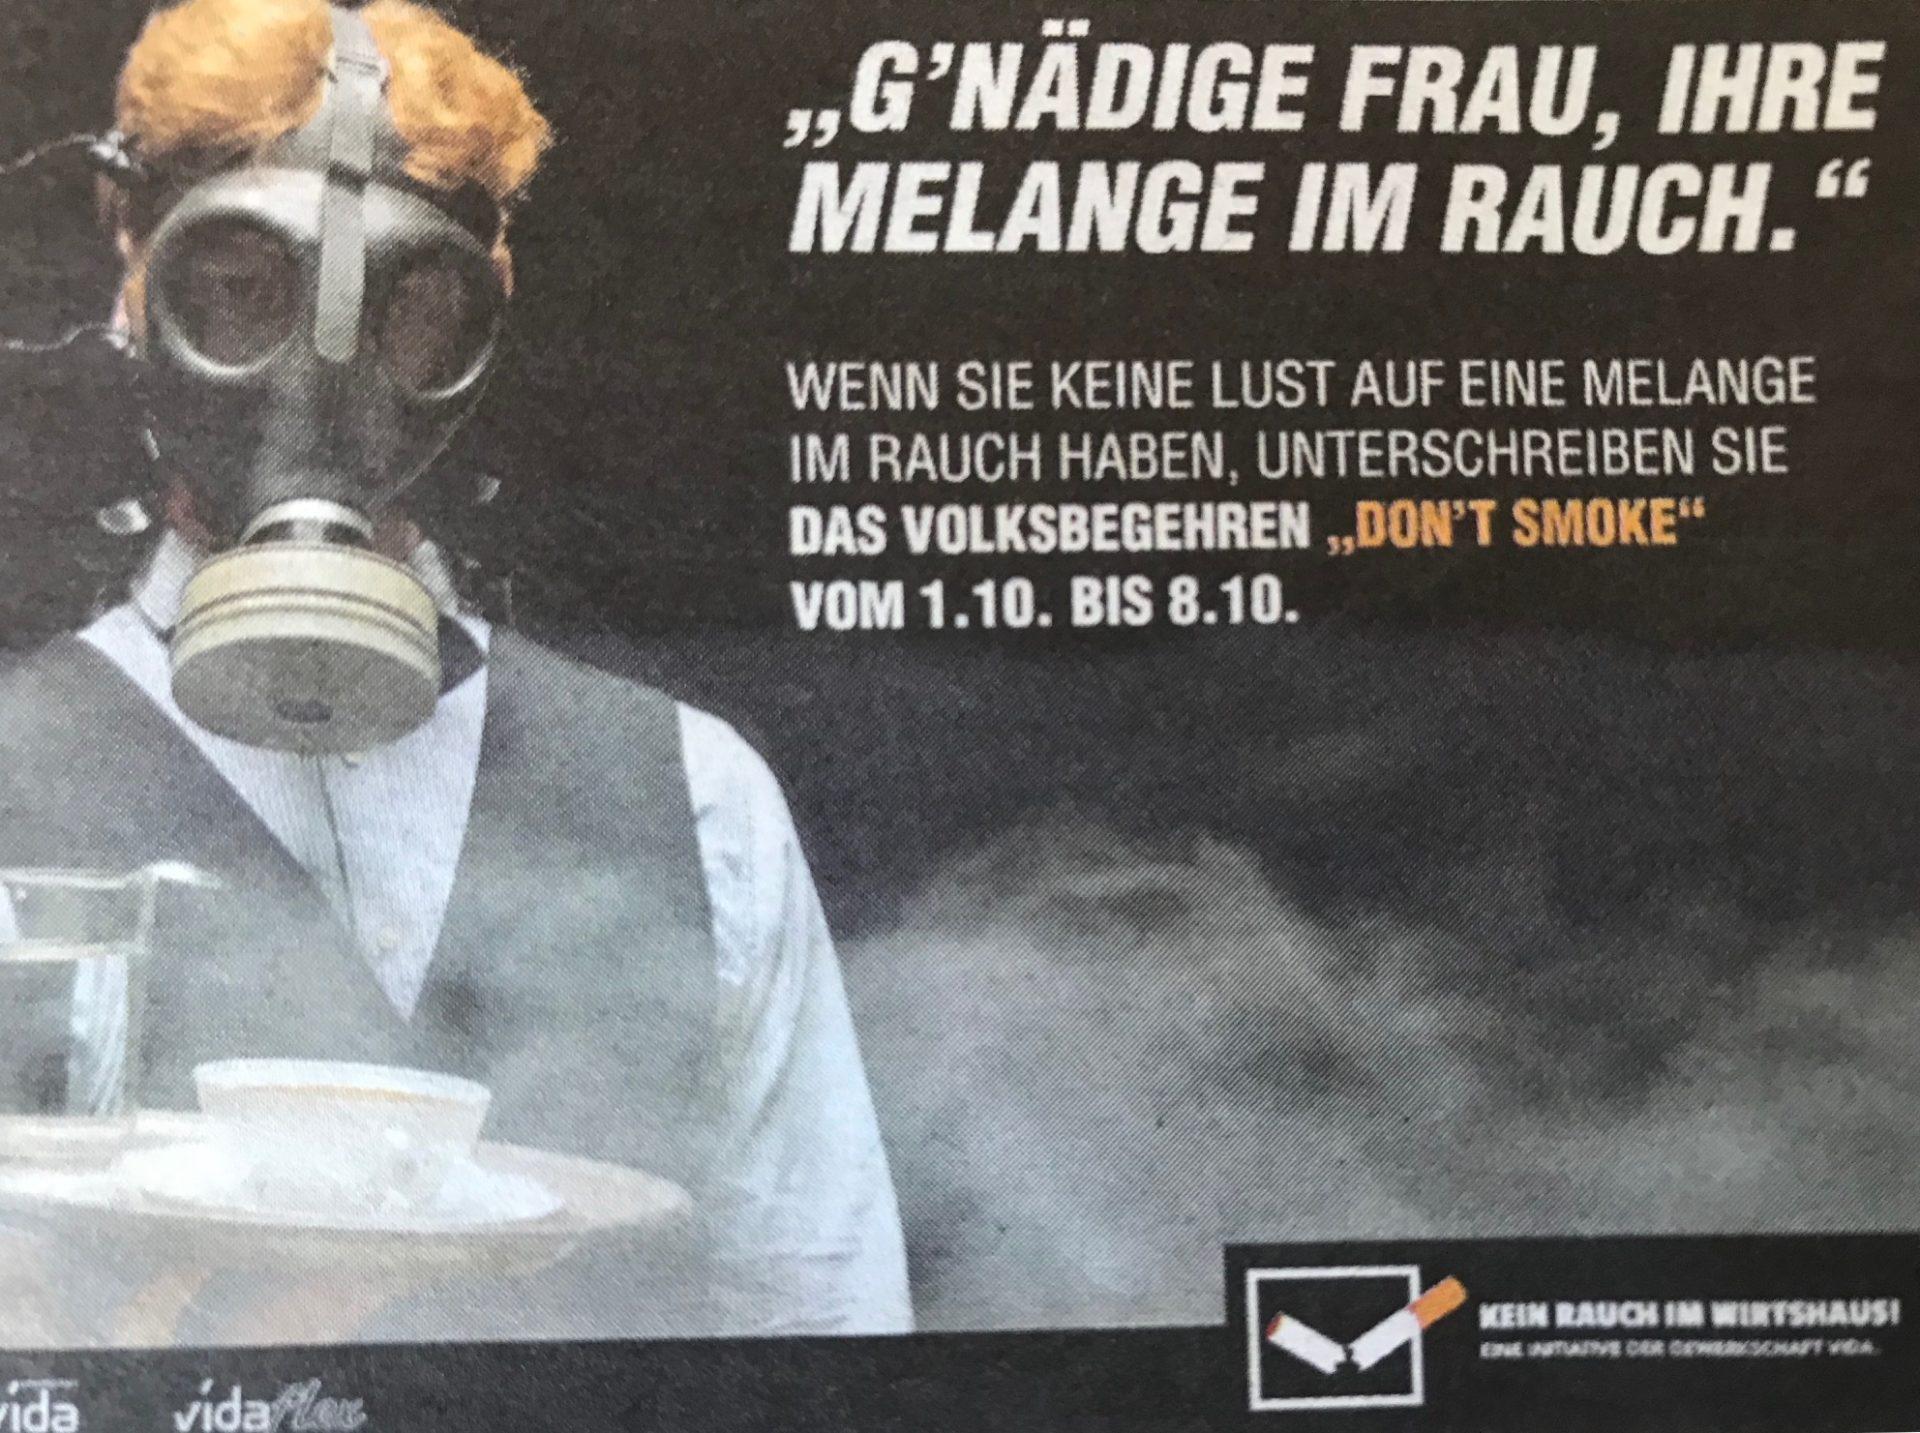 Austrian smoking laws